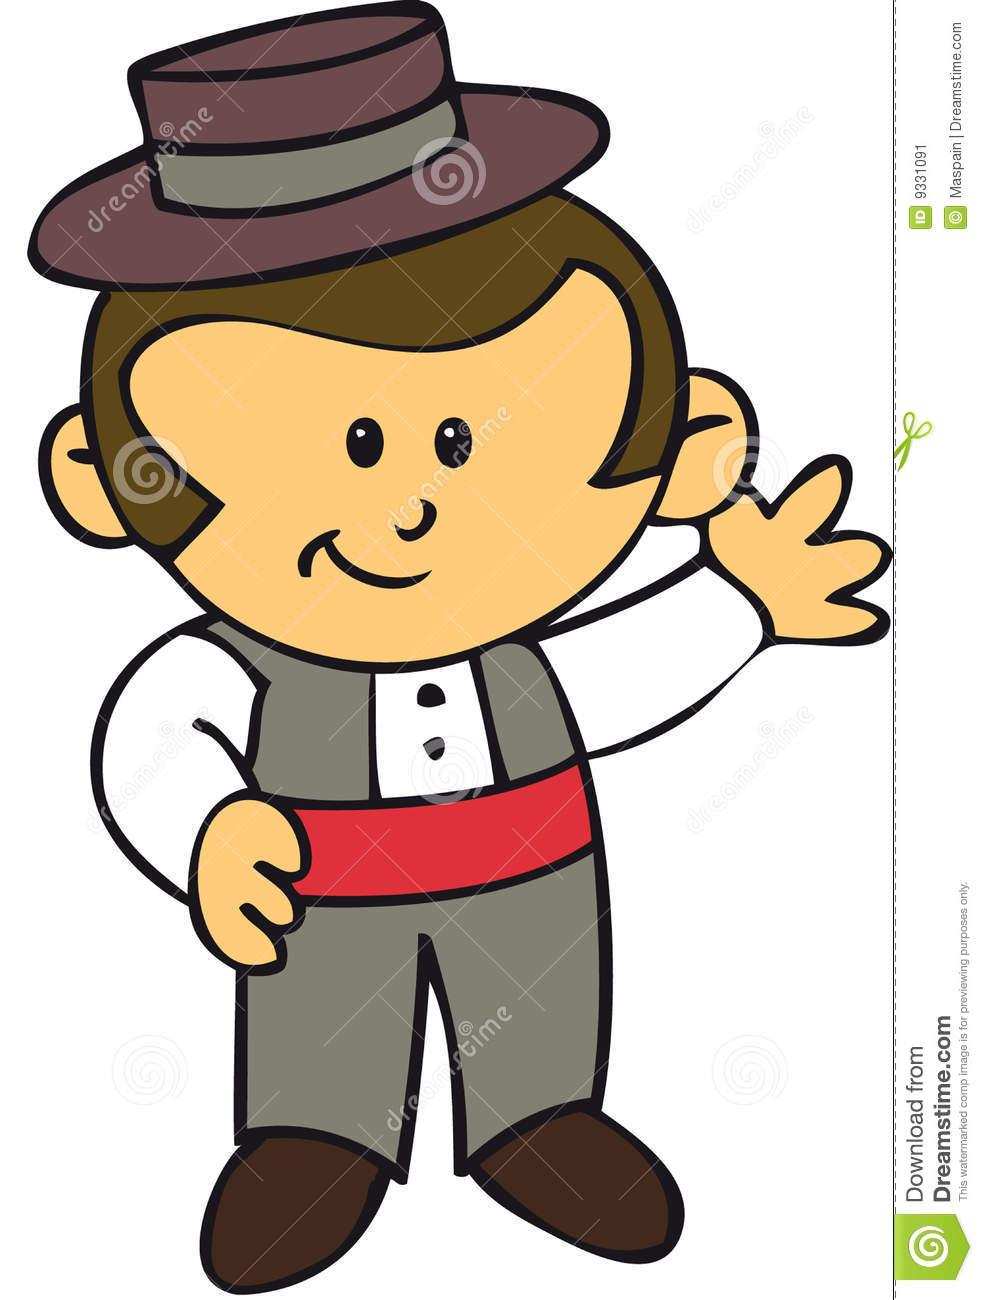 Gipsy Spanish Boy Feria Seville Stock Image.